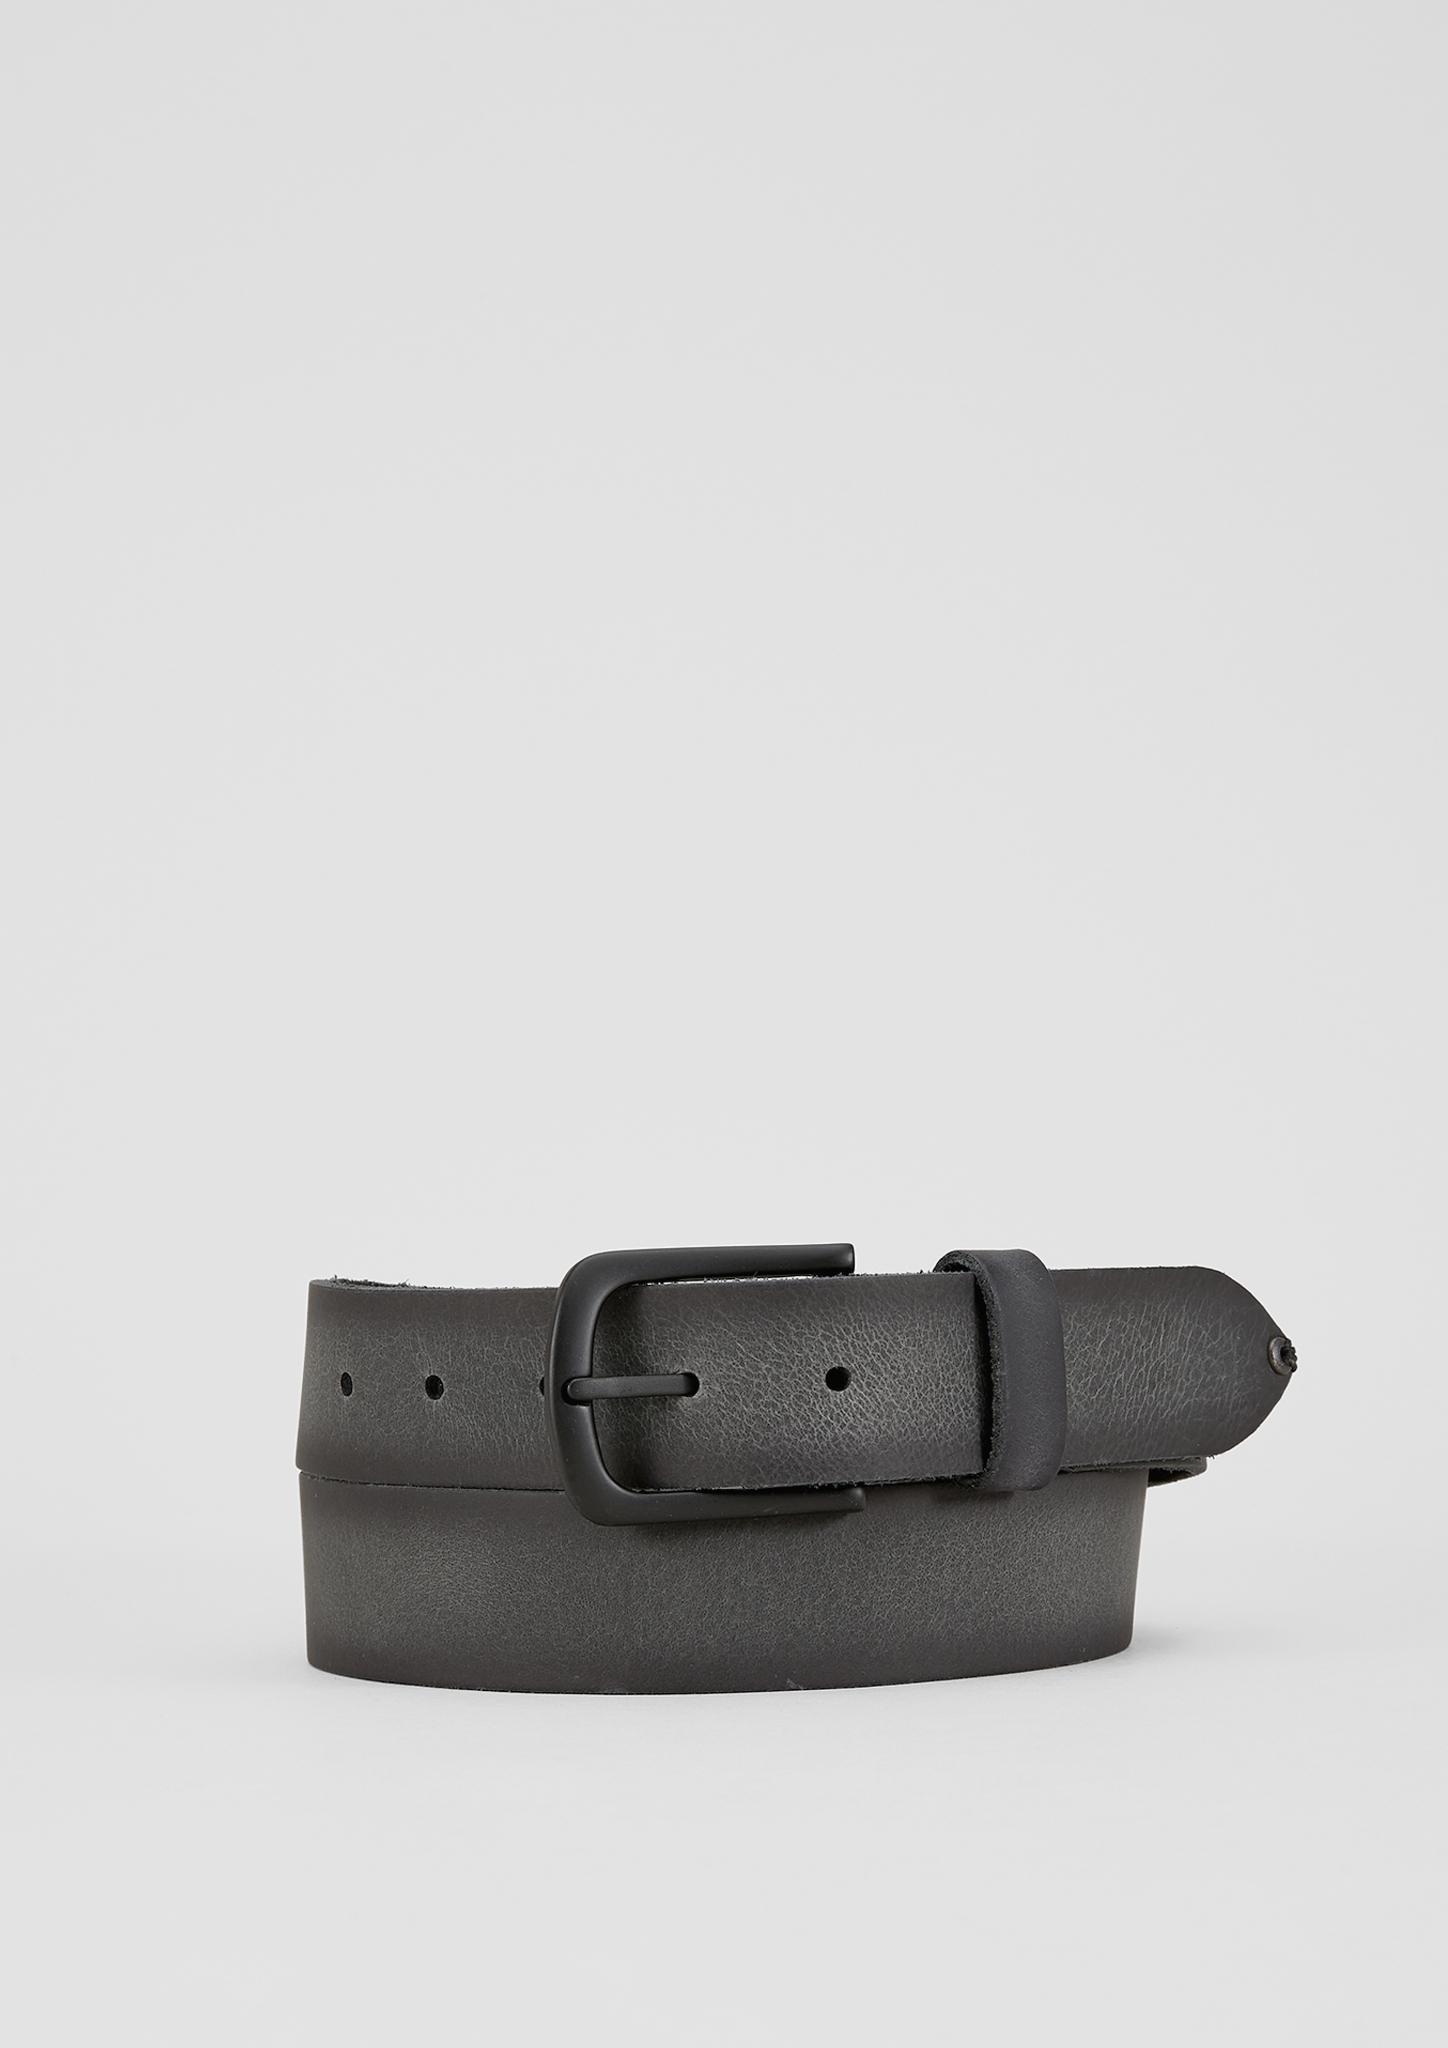 Vintage-Ledergürtel | Accessoires > Gürtel > Sonstige Gürtel | Grau | 100% leder | s.Oliver